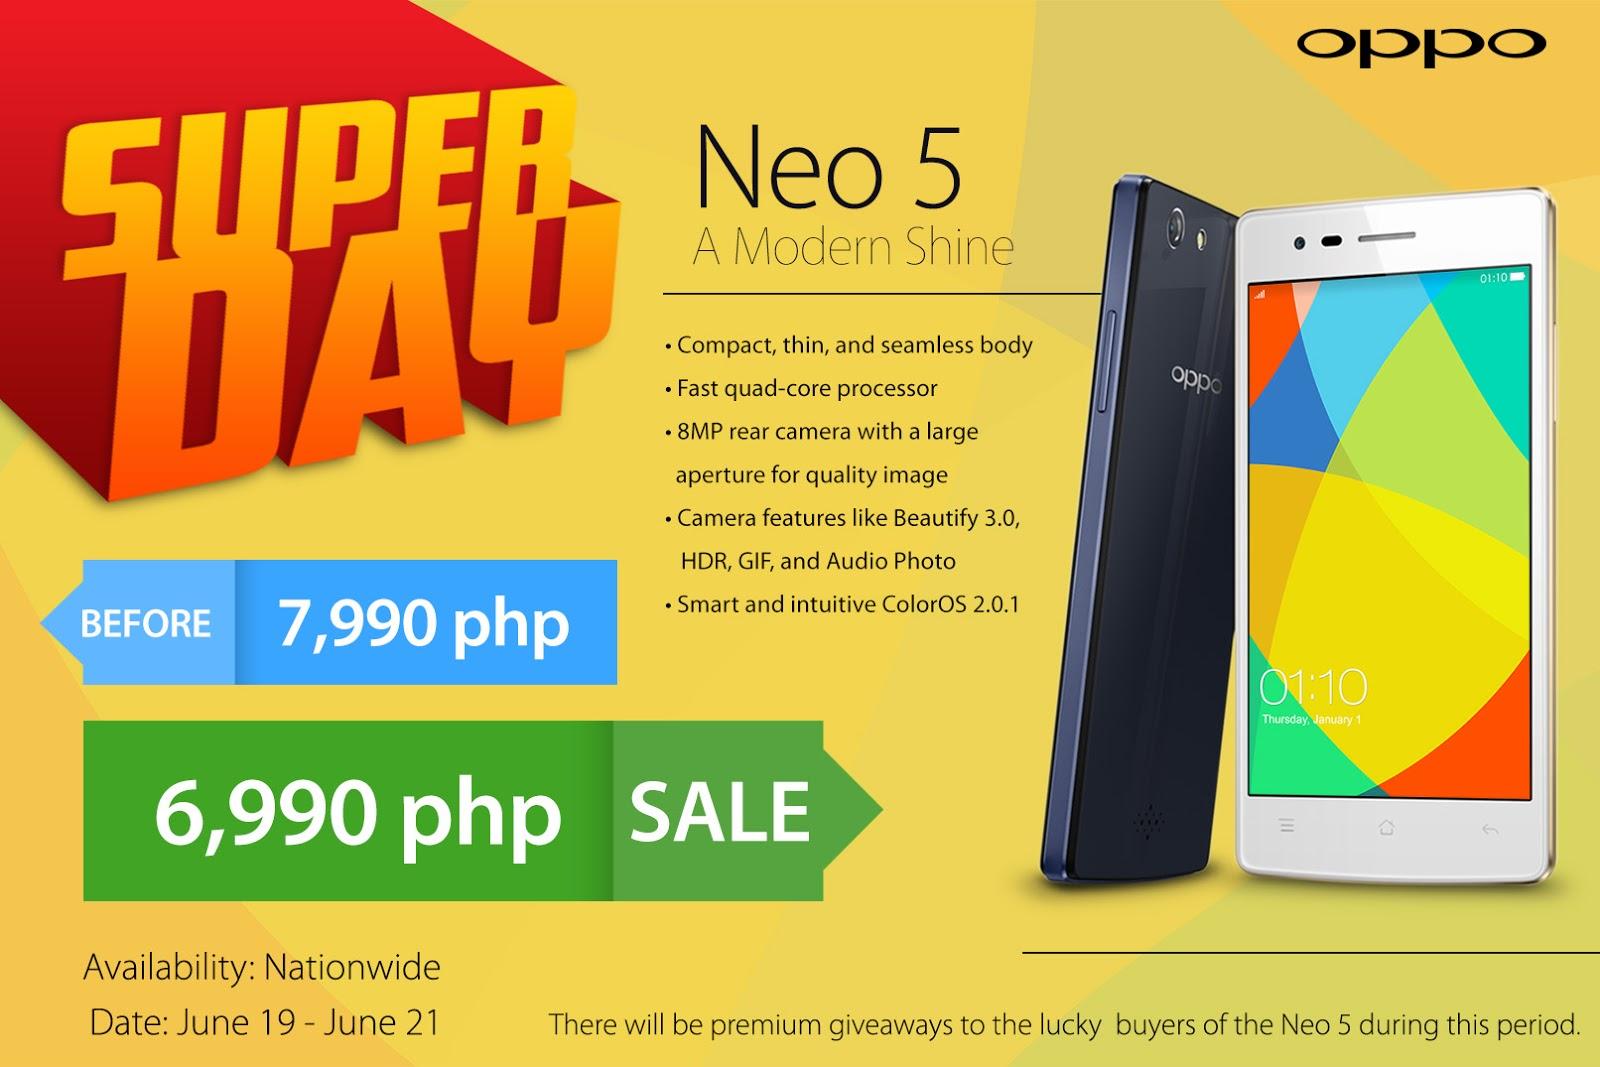 OPPO Neo 5 Promo